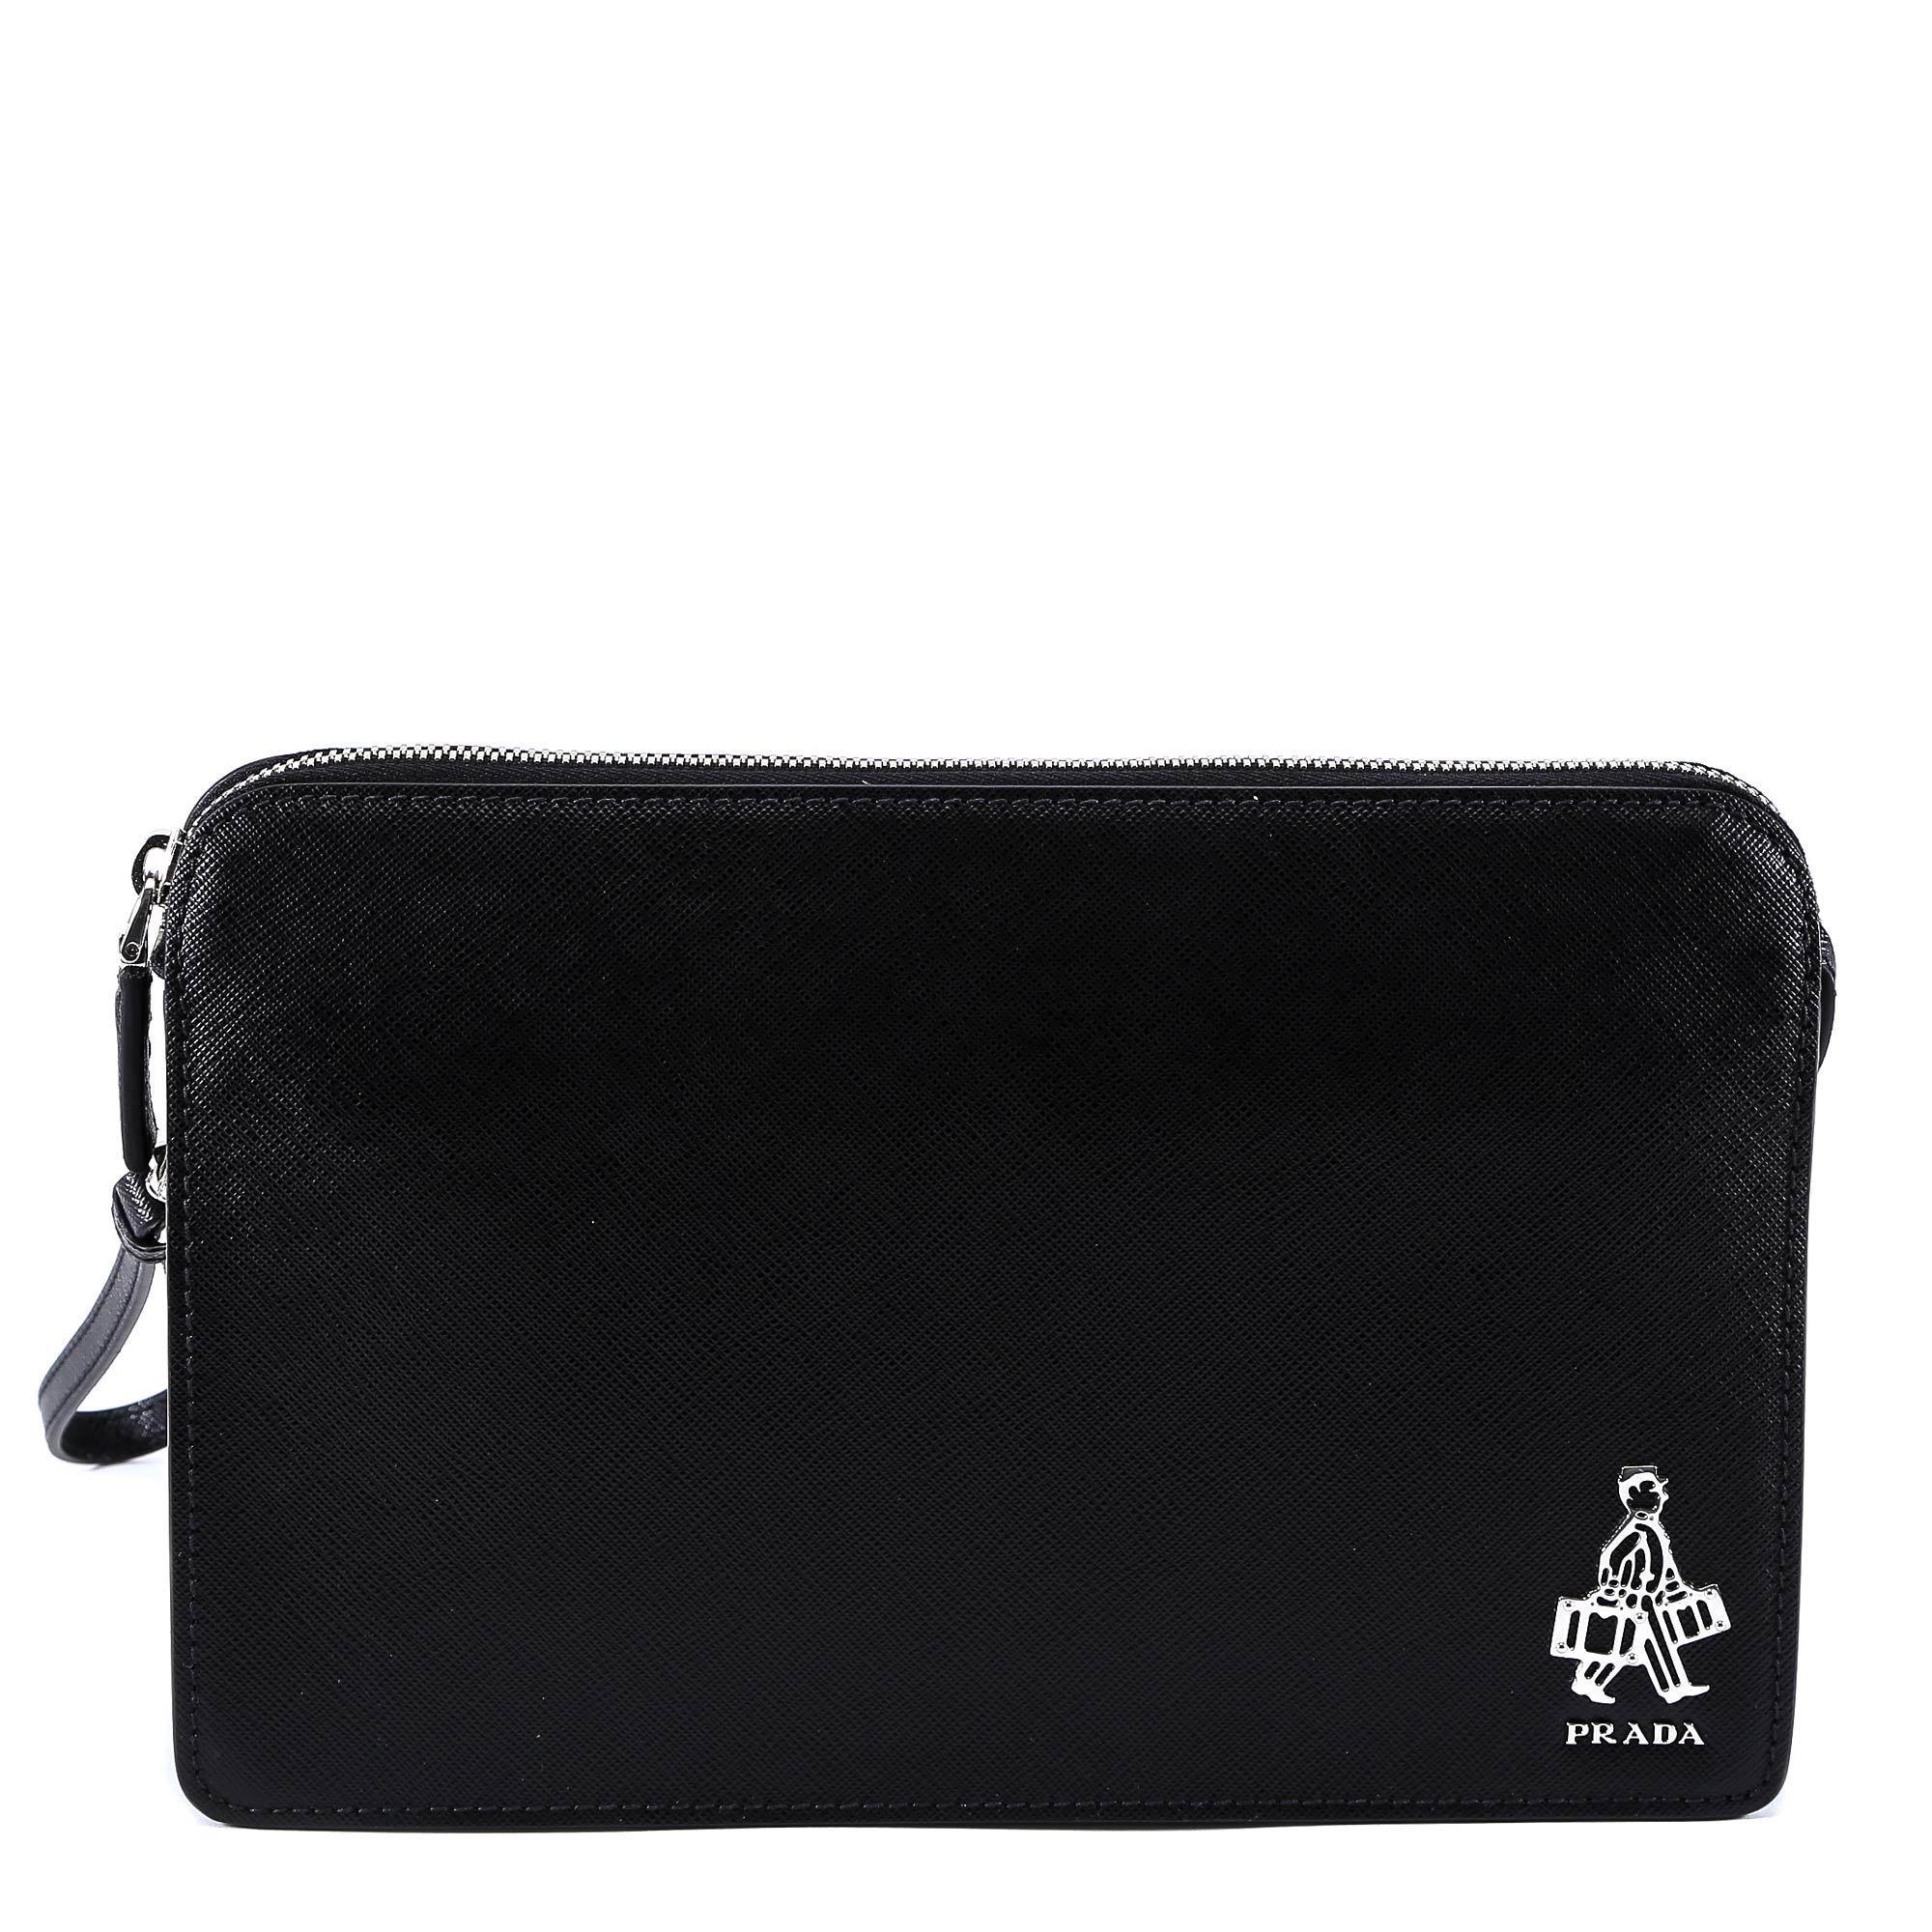 9de9fe74212160 Lyst - Prada Shopper Plaque Saffiano Clutch Bag in Black